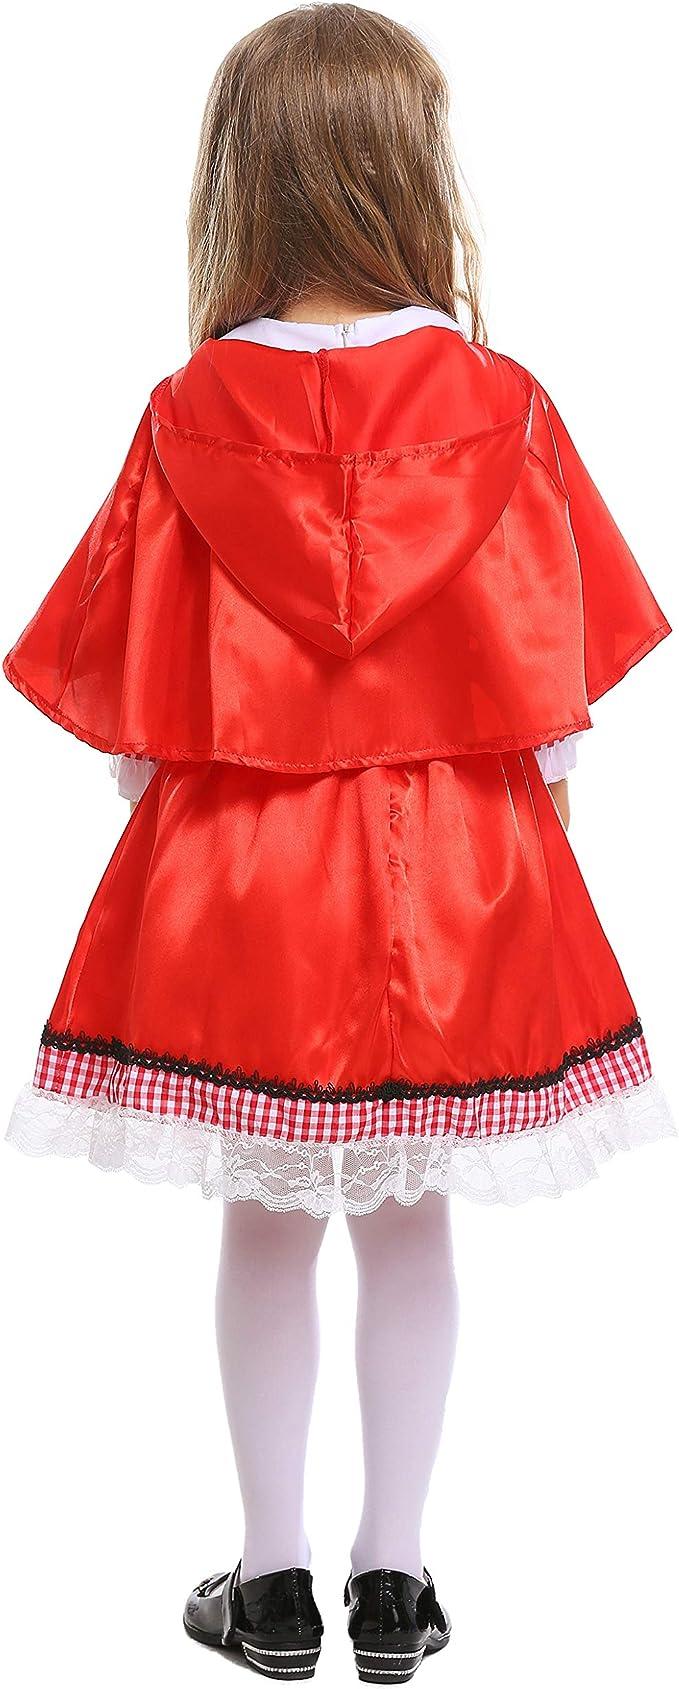 LOLANTA Disfraz de Caperucita Roja para niñas Disfraz de Cosplay ...